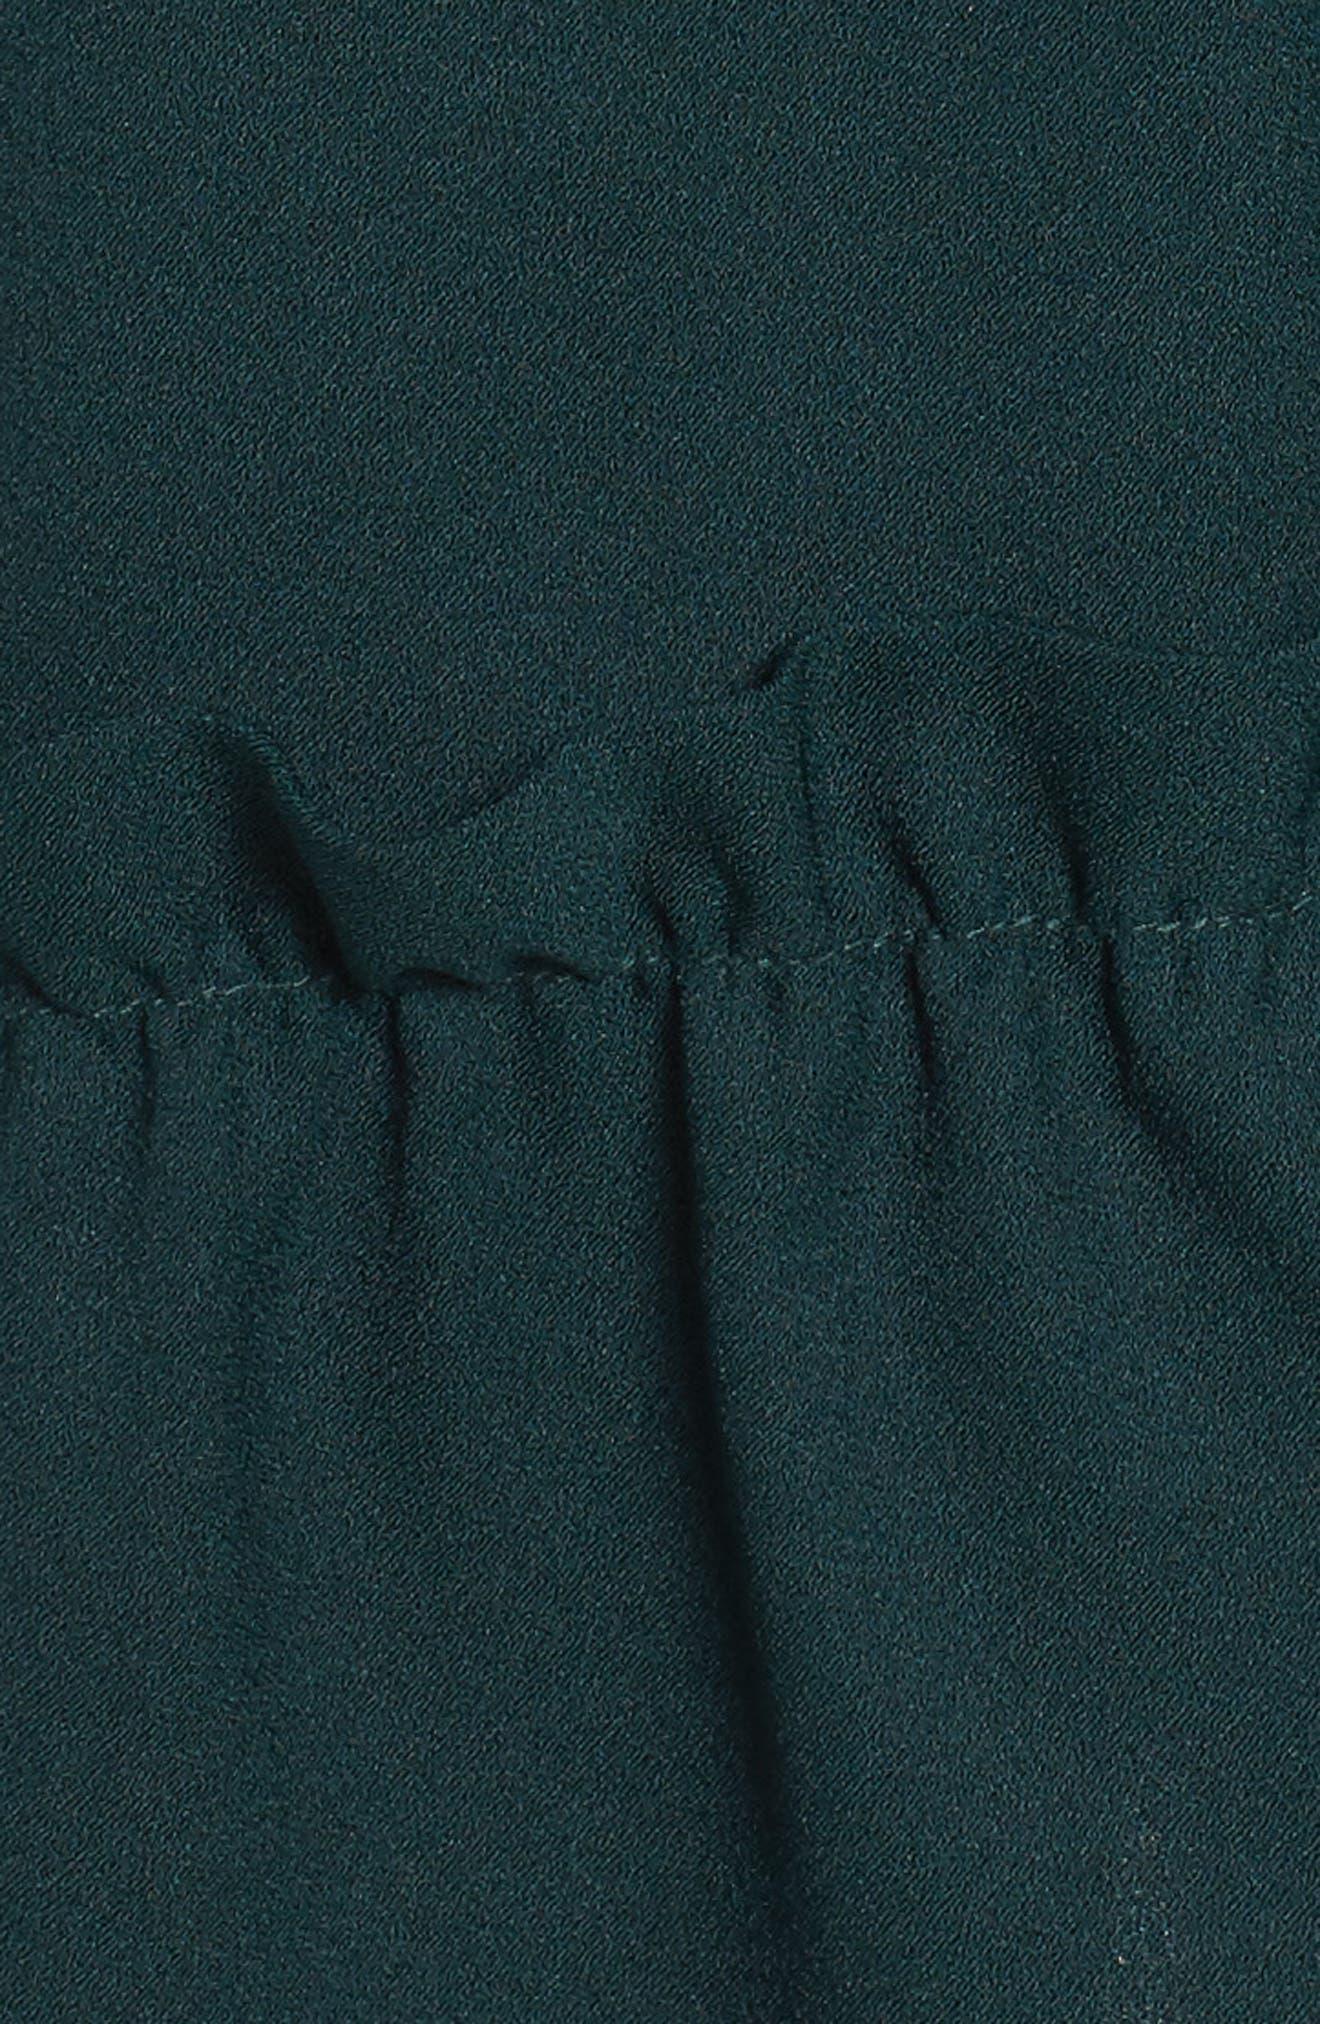 Cold Shoulder Shirtdress,                             Alternate thumbnail 5, color,                             310